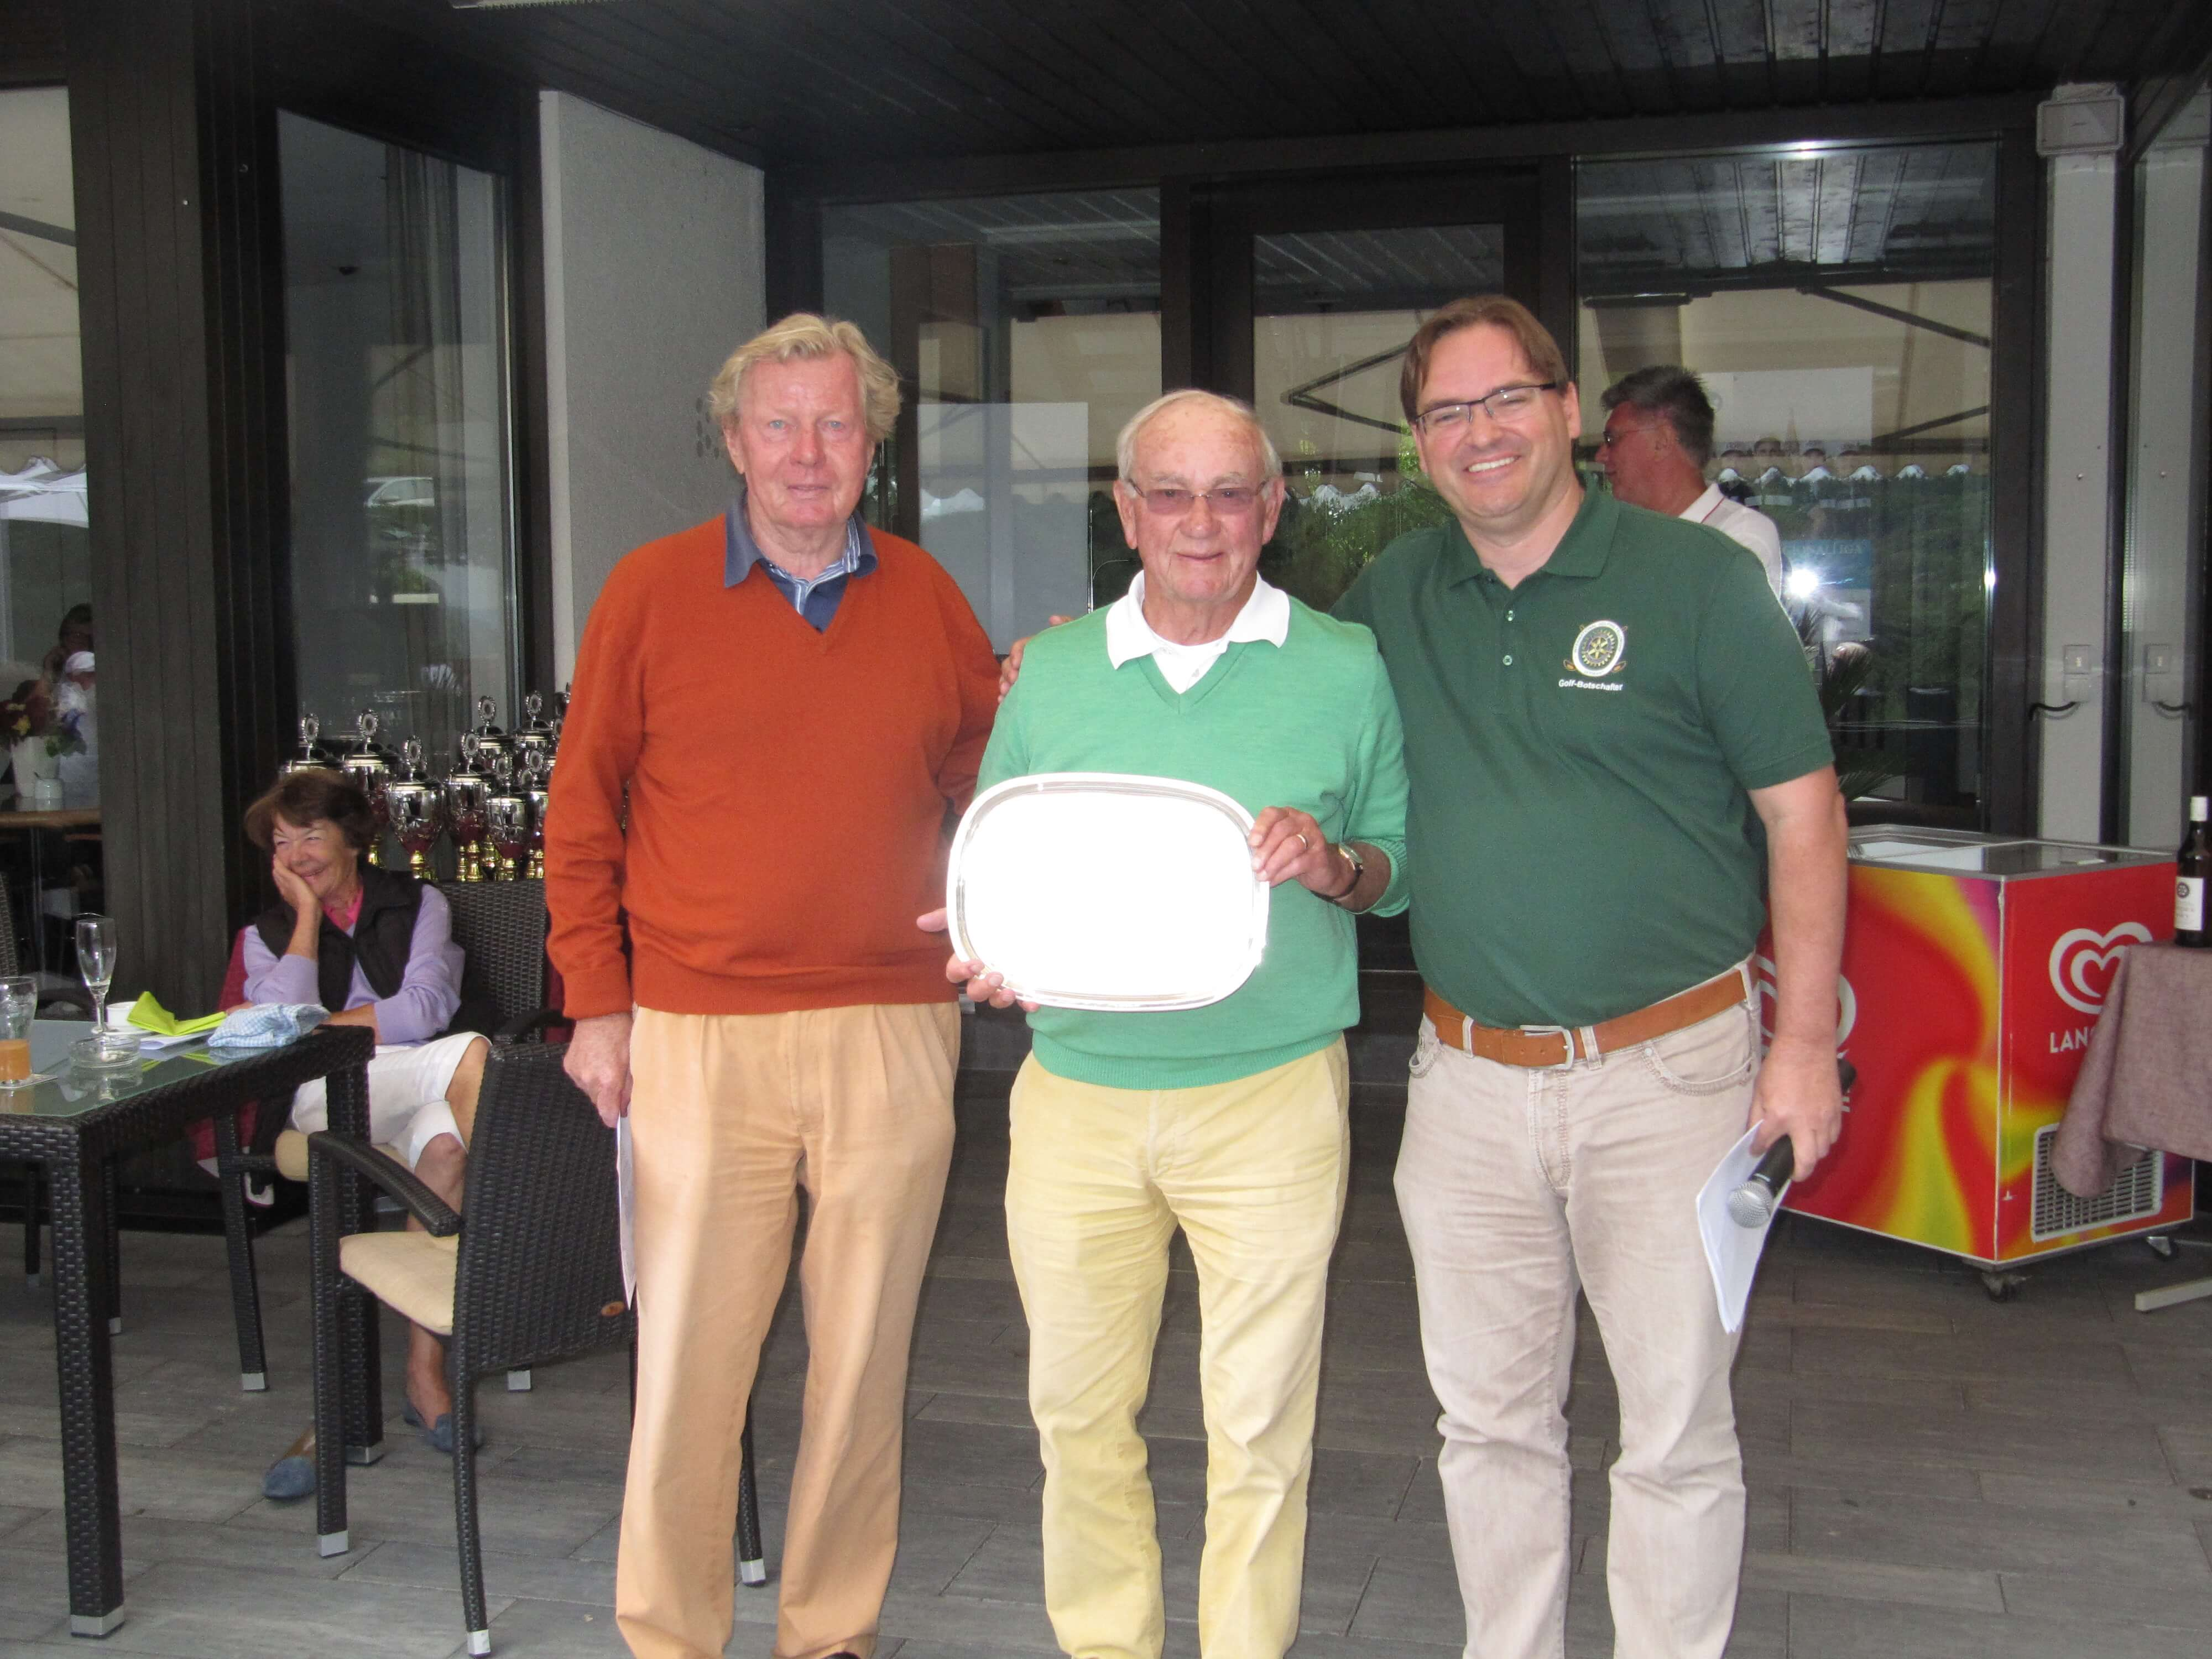 Sonderwertung Hermann Lindhorst Preis v.l.n.r. Hermann Lindhorst, Sieger Hartmut Strecker, VV Thomas Hasak